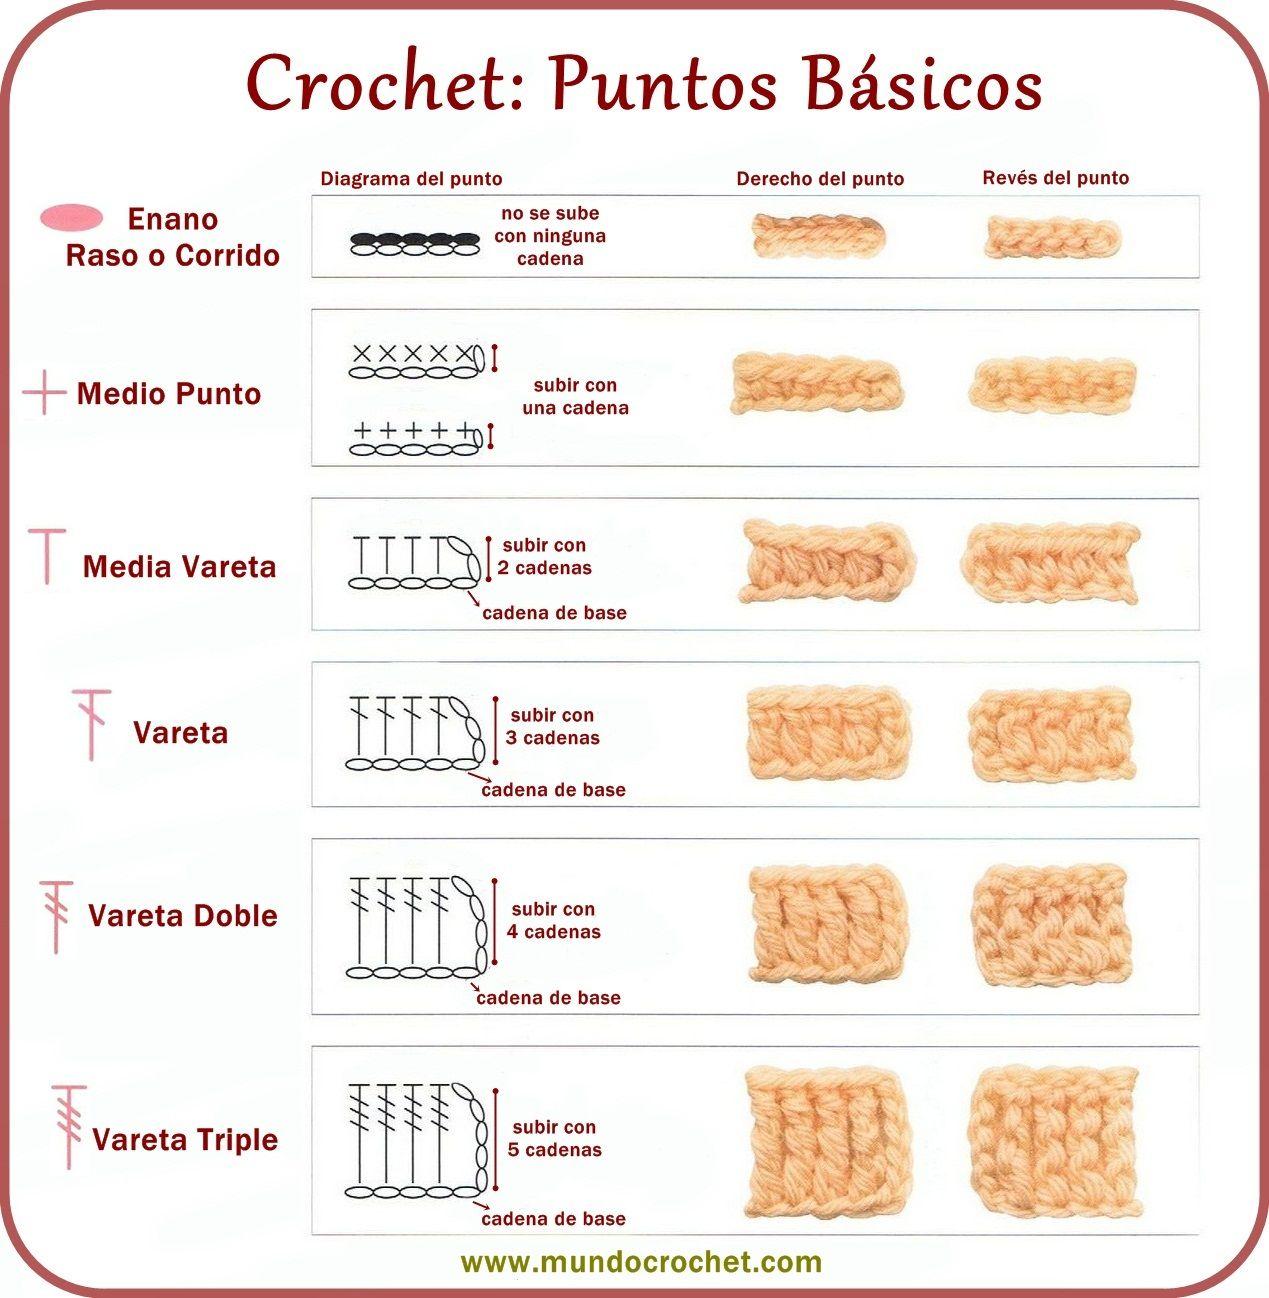 Puntos b sicos crochet crochet basics - Puntos crochet trapillo ...